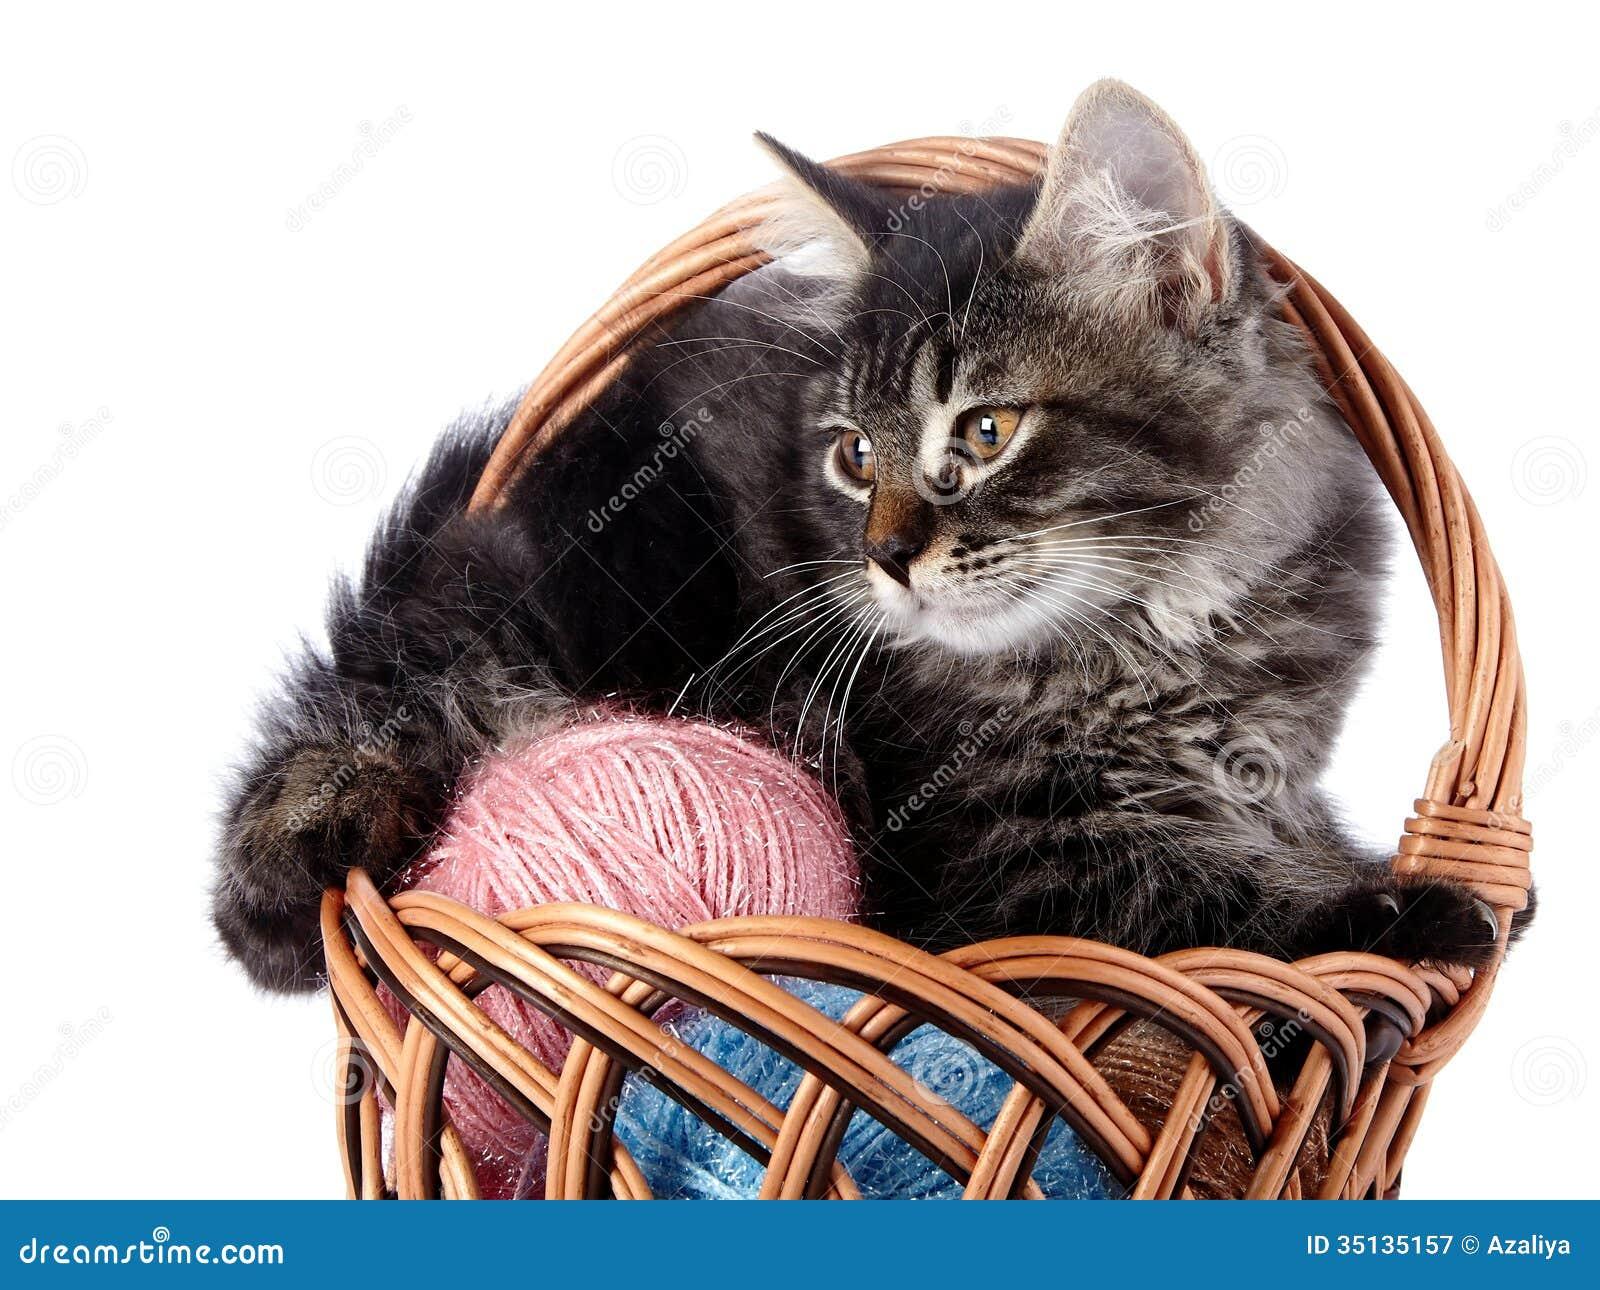 countrycat arctic cat